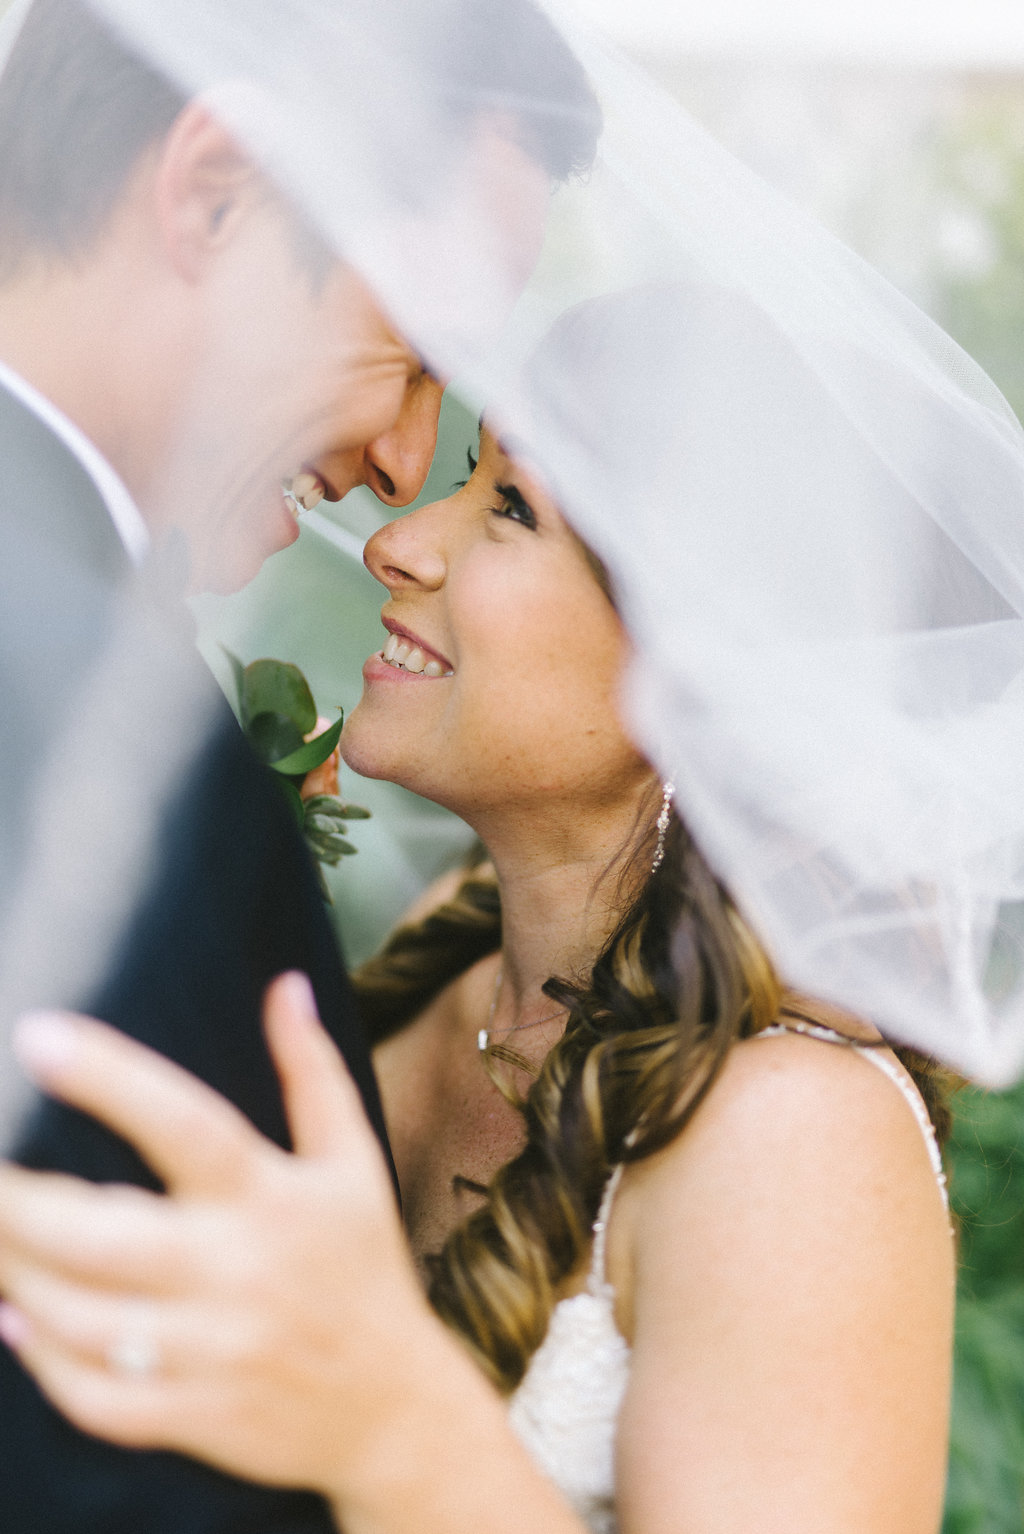 Creative Florida Bride and Groom Wedding Portrait Under Veil | Tampa Bay Photographer Kera Photography | Hair and Makeup Michele Renee the Studio